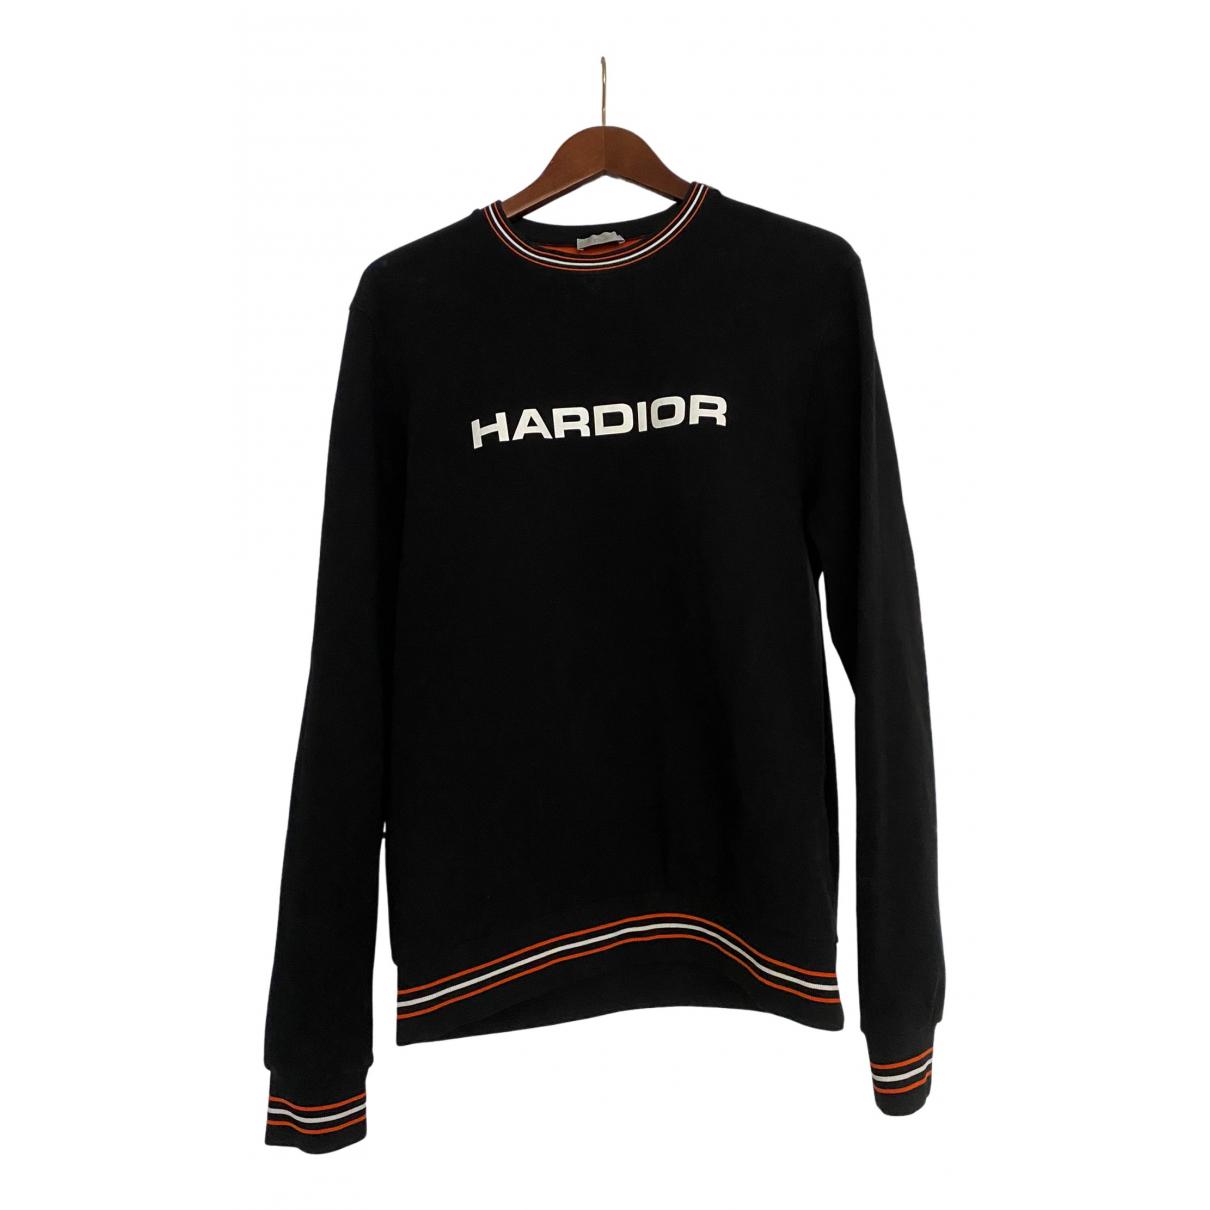 Dior Homme \N Black Cotton Knitwear & Sweatshirts for Men L International